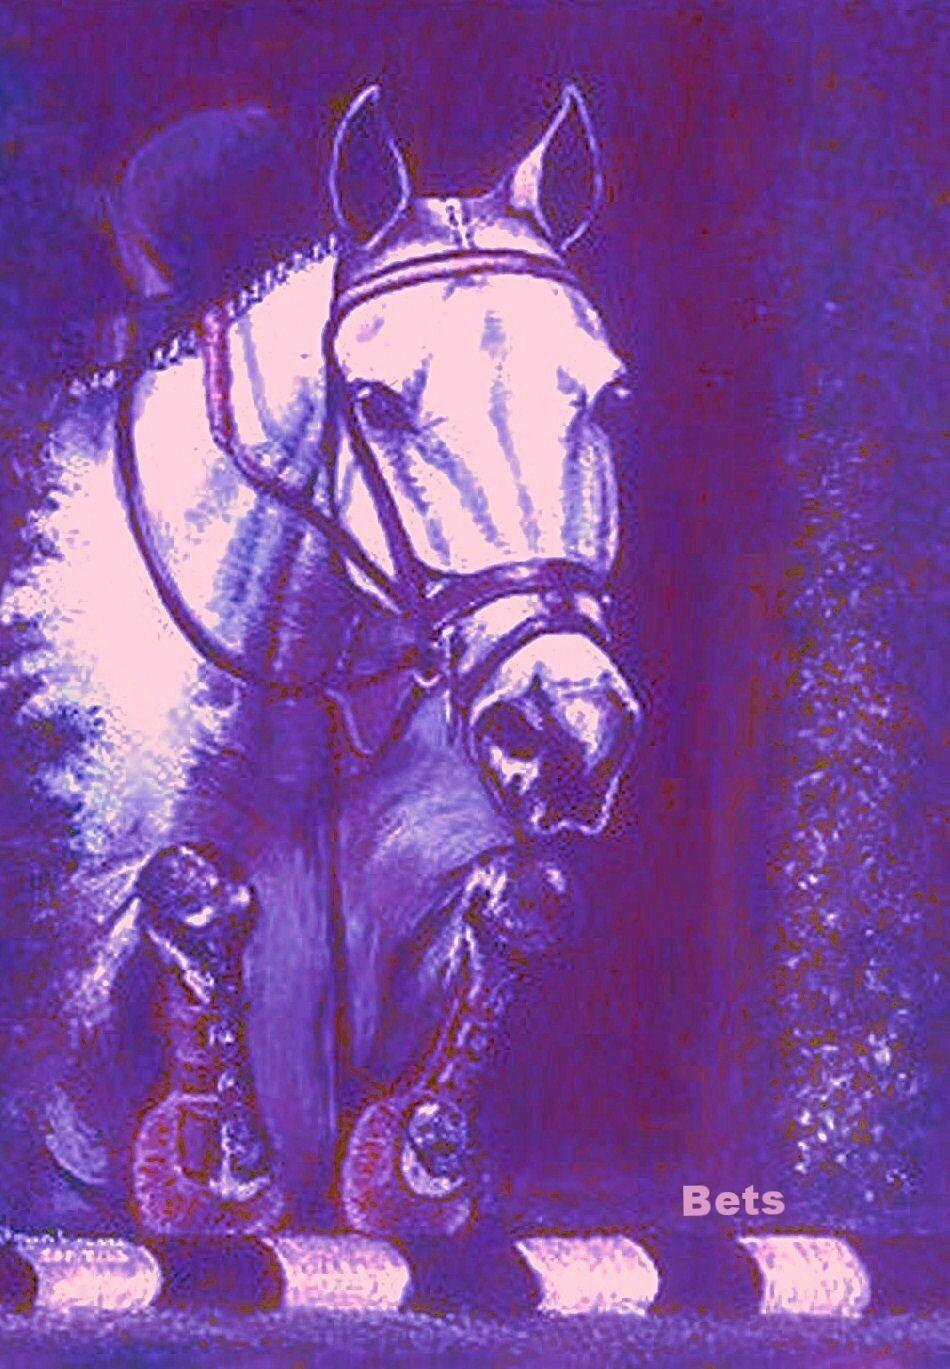 HORSE PRINT Giclee JUMPER  Art NO FAULTS artist BETS  6 COLORS print size 14 X 19  authentic